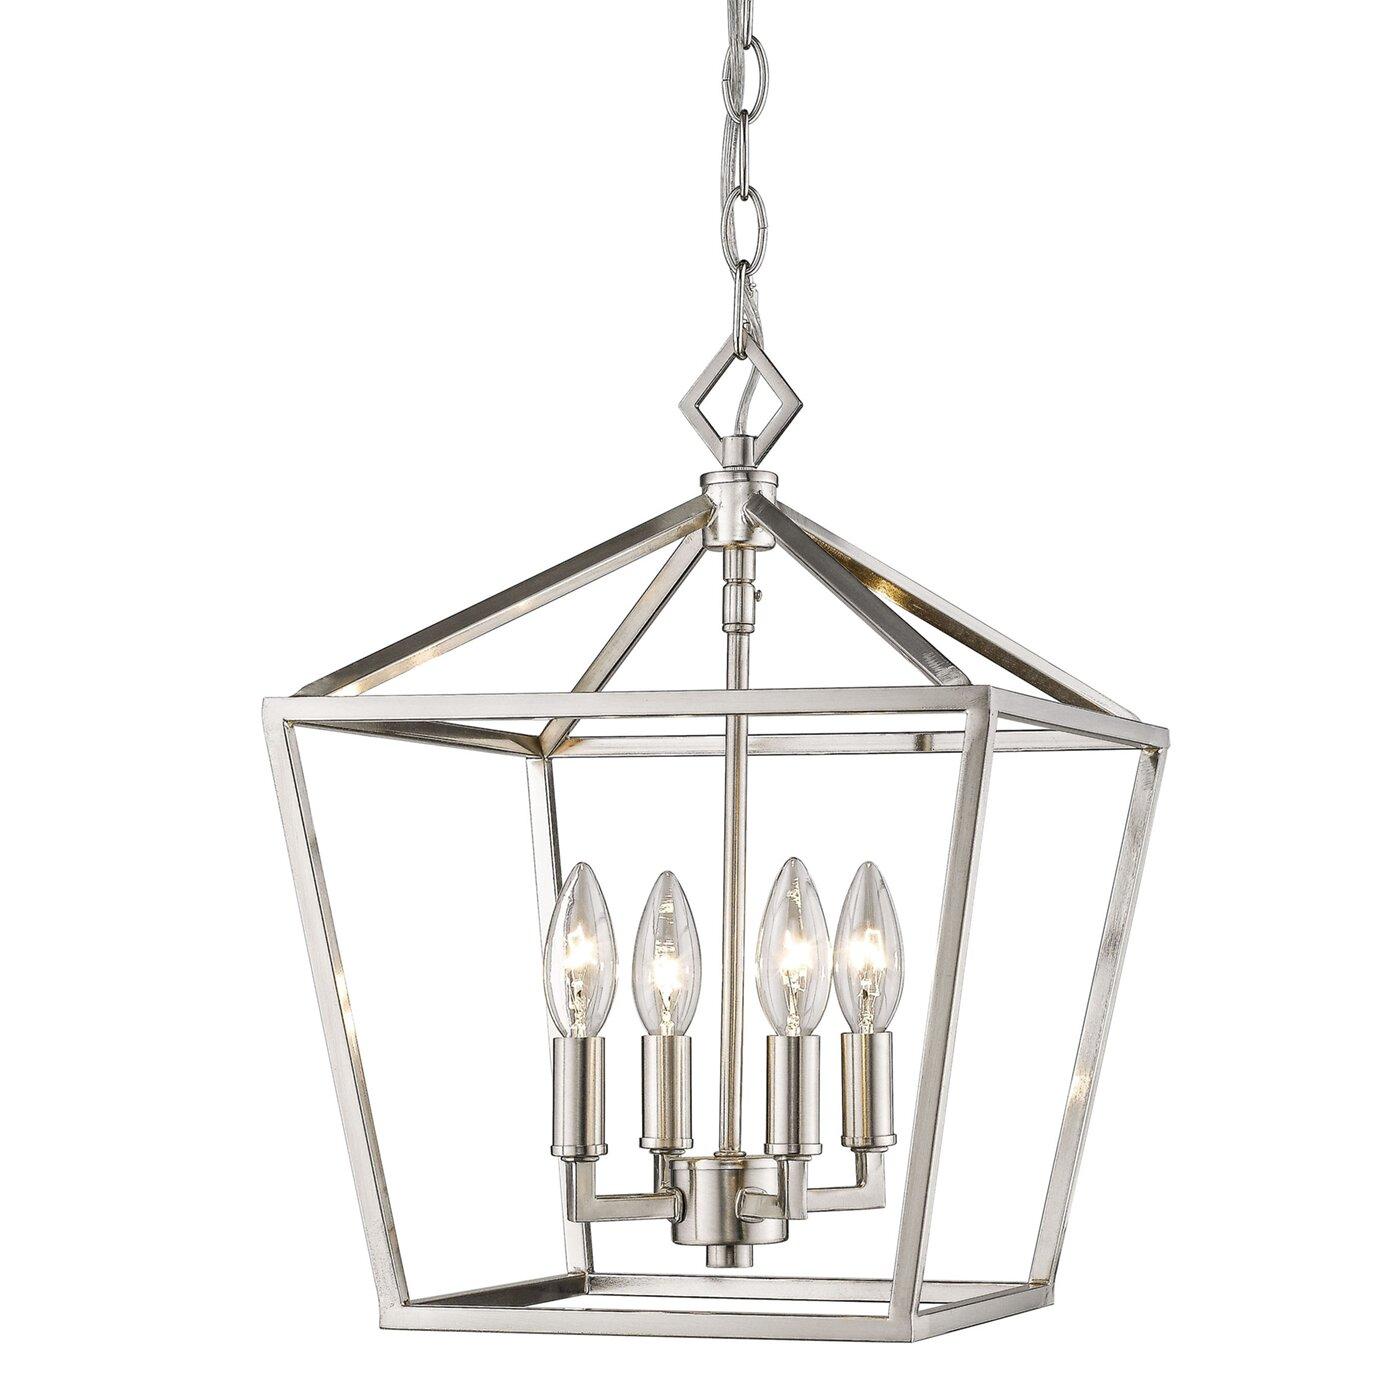 Satin Nickel Pendant Lighting You Ll Love In 2021 Wayfair